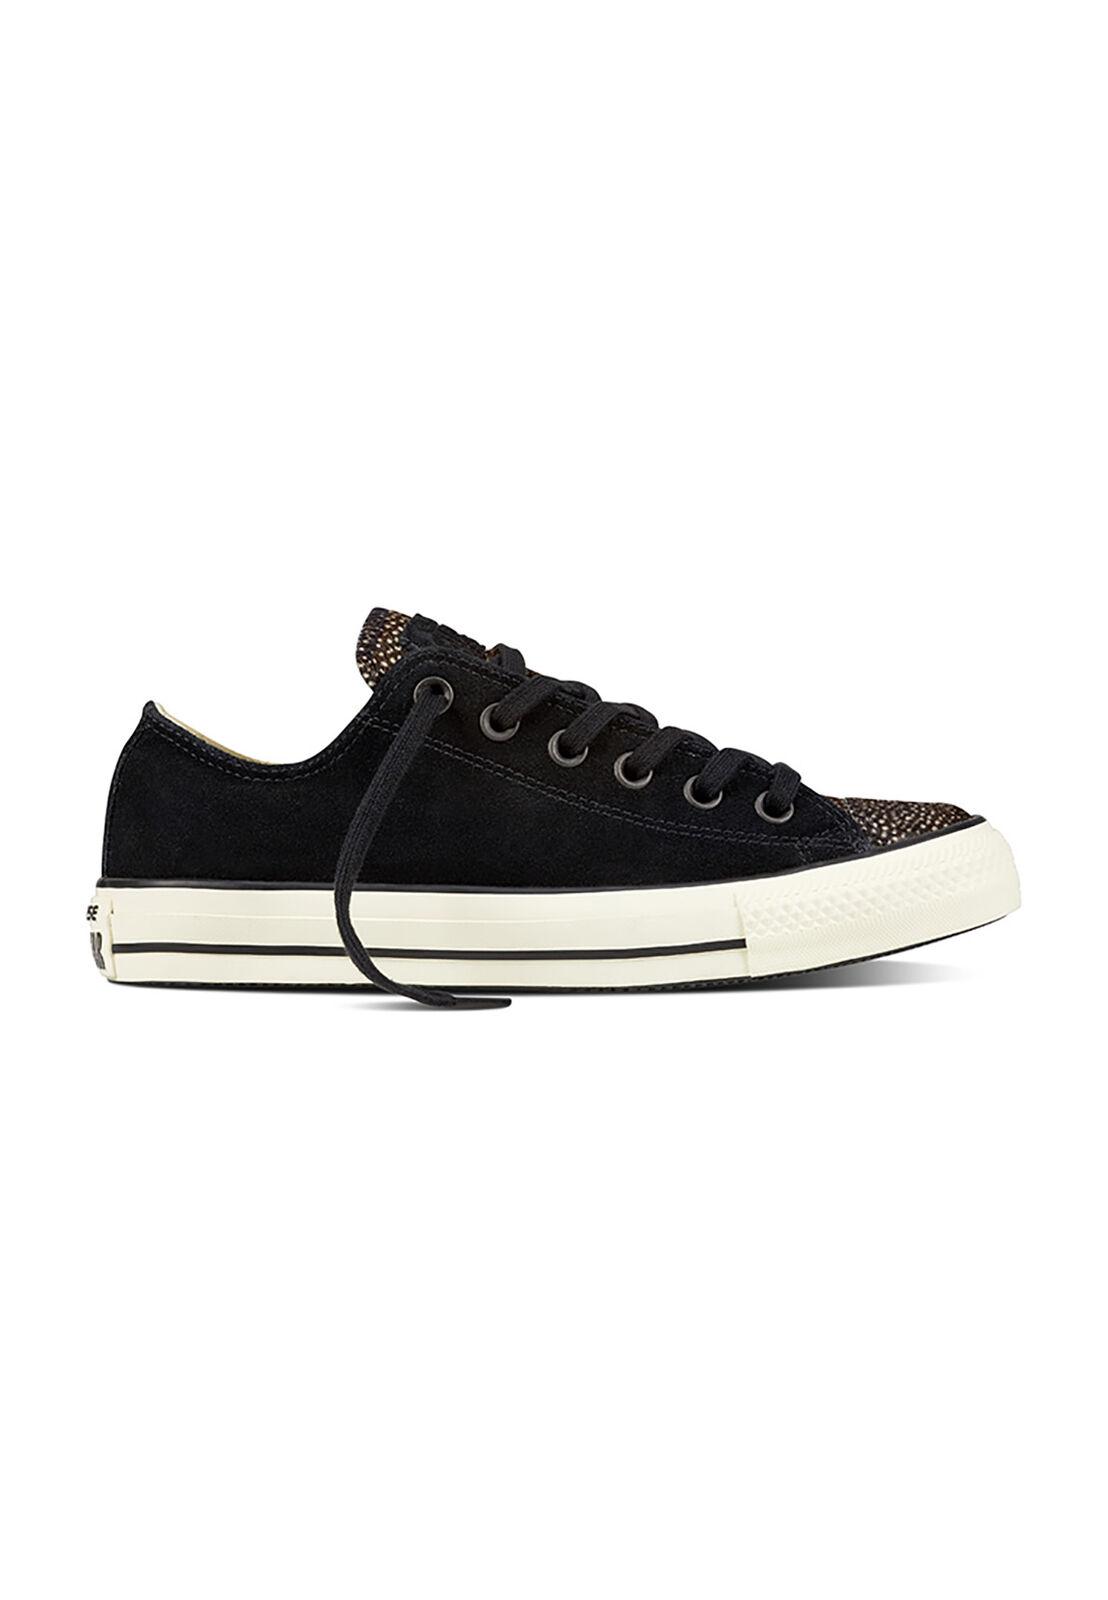 Converse Chucks Low CT AS OX 157666C black Black